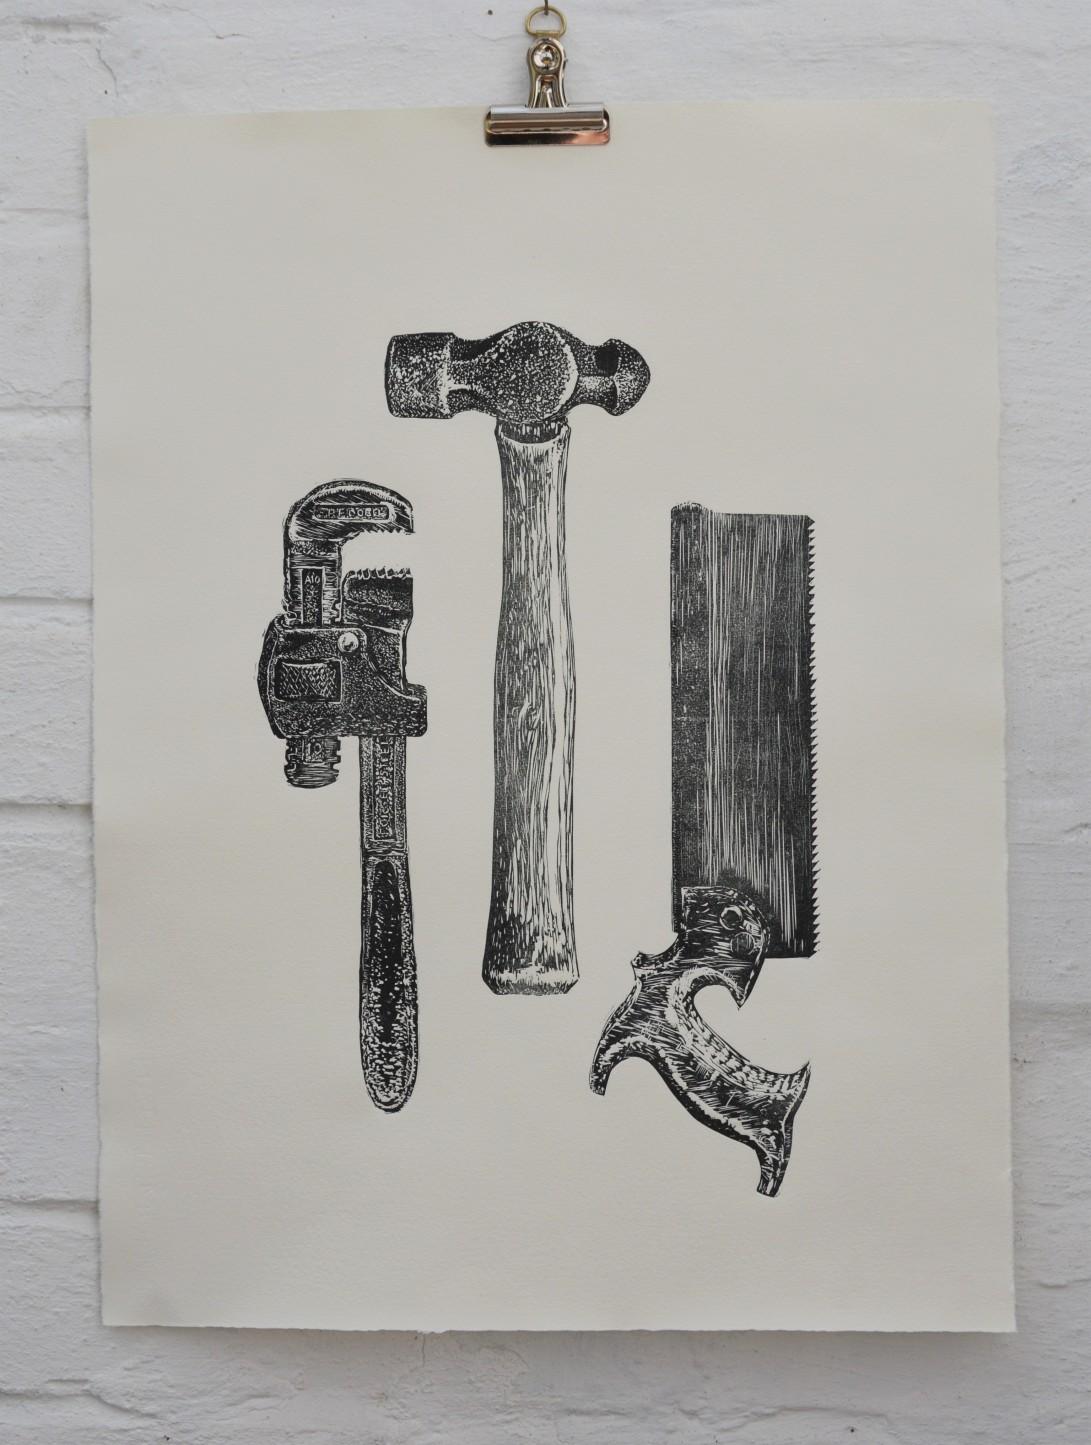 Vintage hand tools linocut. copyright Alison Sloggett